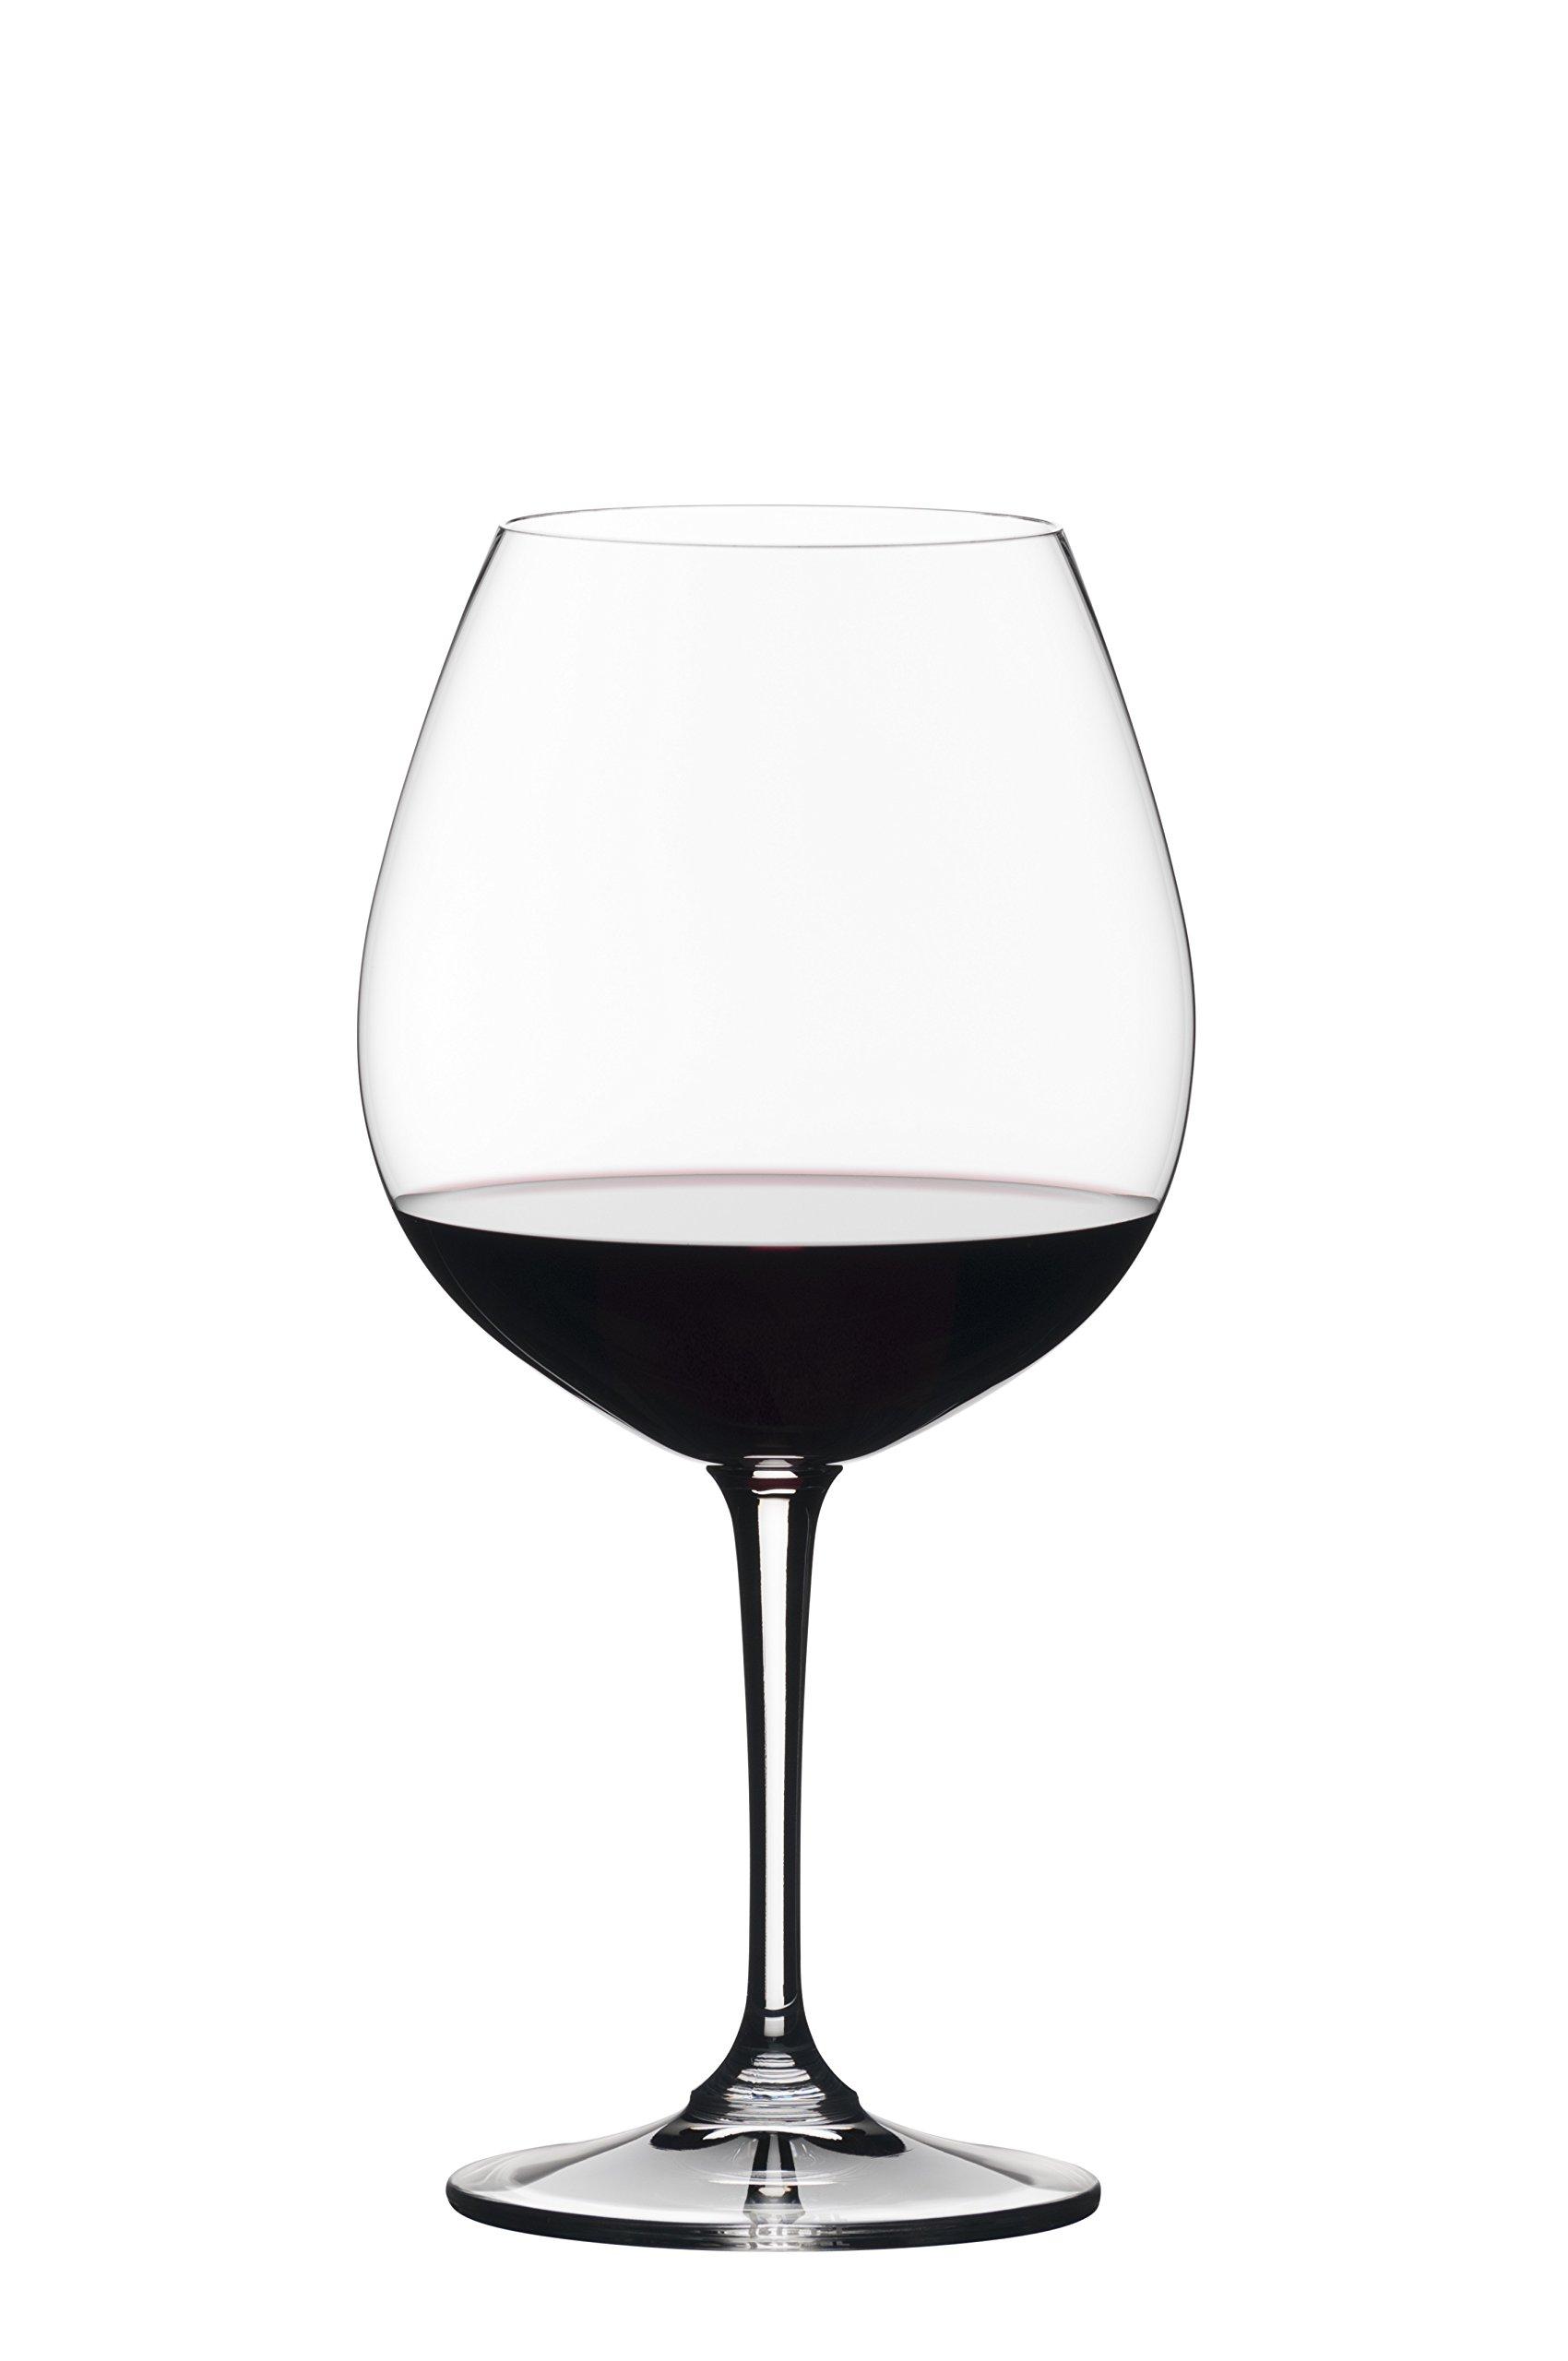 Riedel 0484/07 Vivant Pinot Noir Wine Glass, Set of 4 Clear